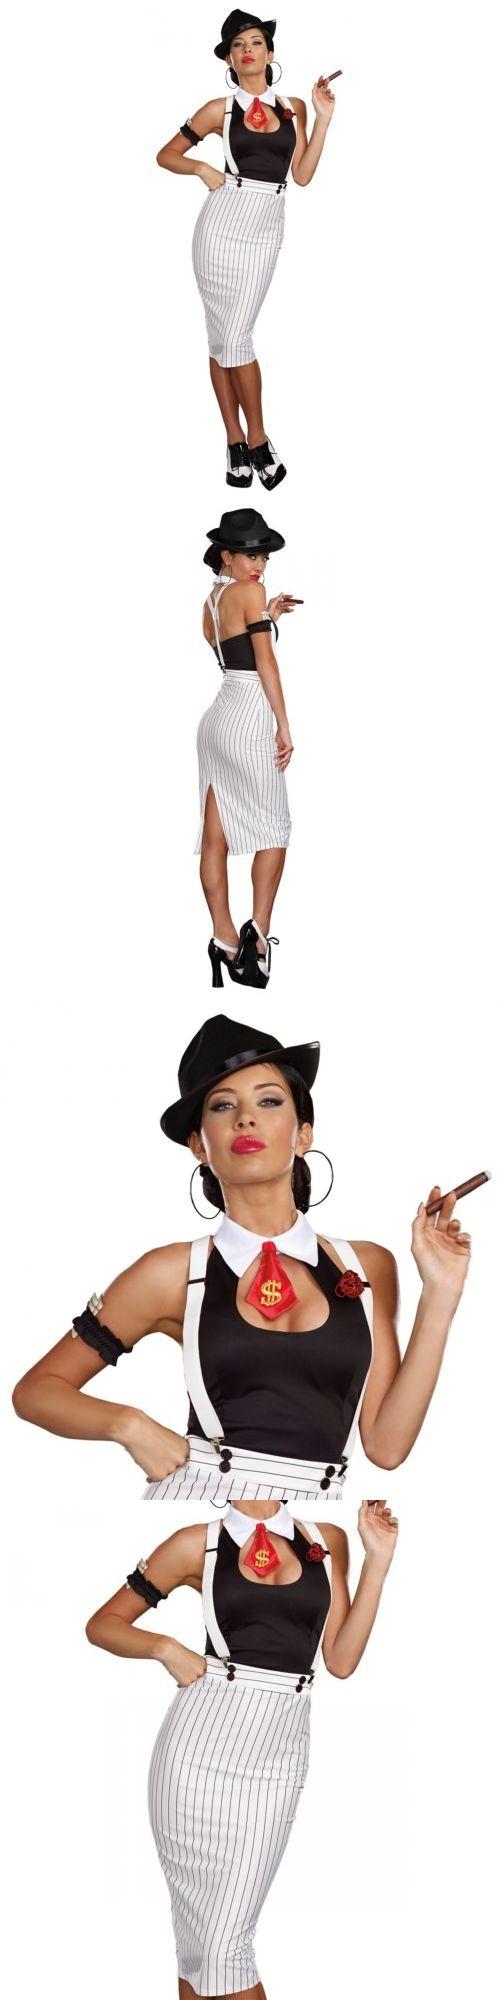 Halloween Costumes Women: Gangster Costume Adult 1920S Mobster Halloween Fancy Dress BUY IT NOW ONLY: $45.89